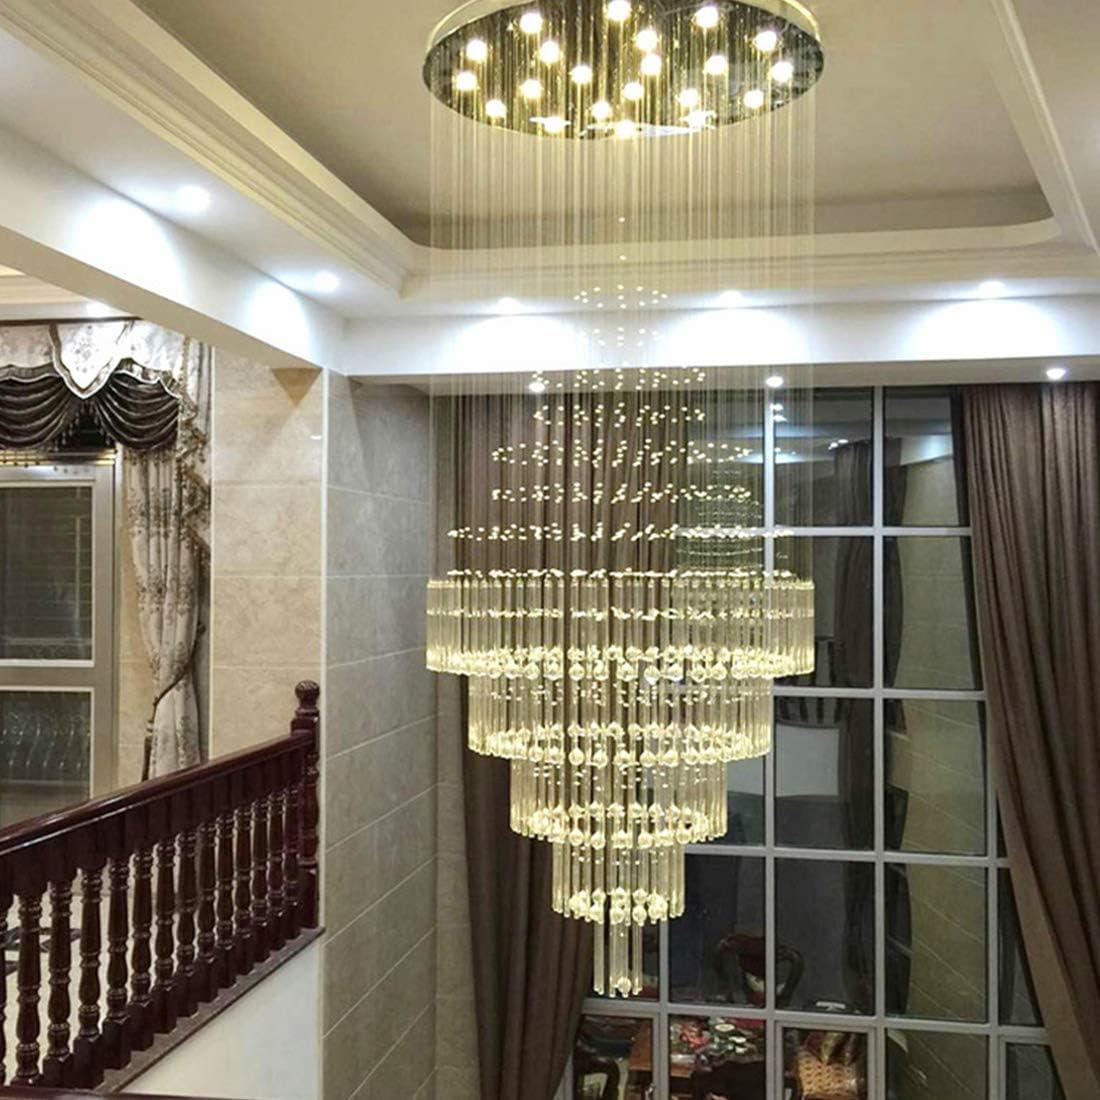 Moooni Large Modern Luxury Crystal Chandelier Raindrop Flush Mount Ceiling Light Fixture for Lobby Porch Living Room D 47.3 x 118 H